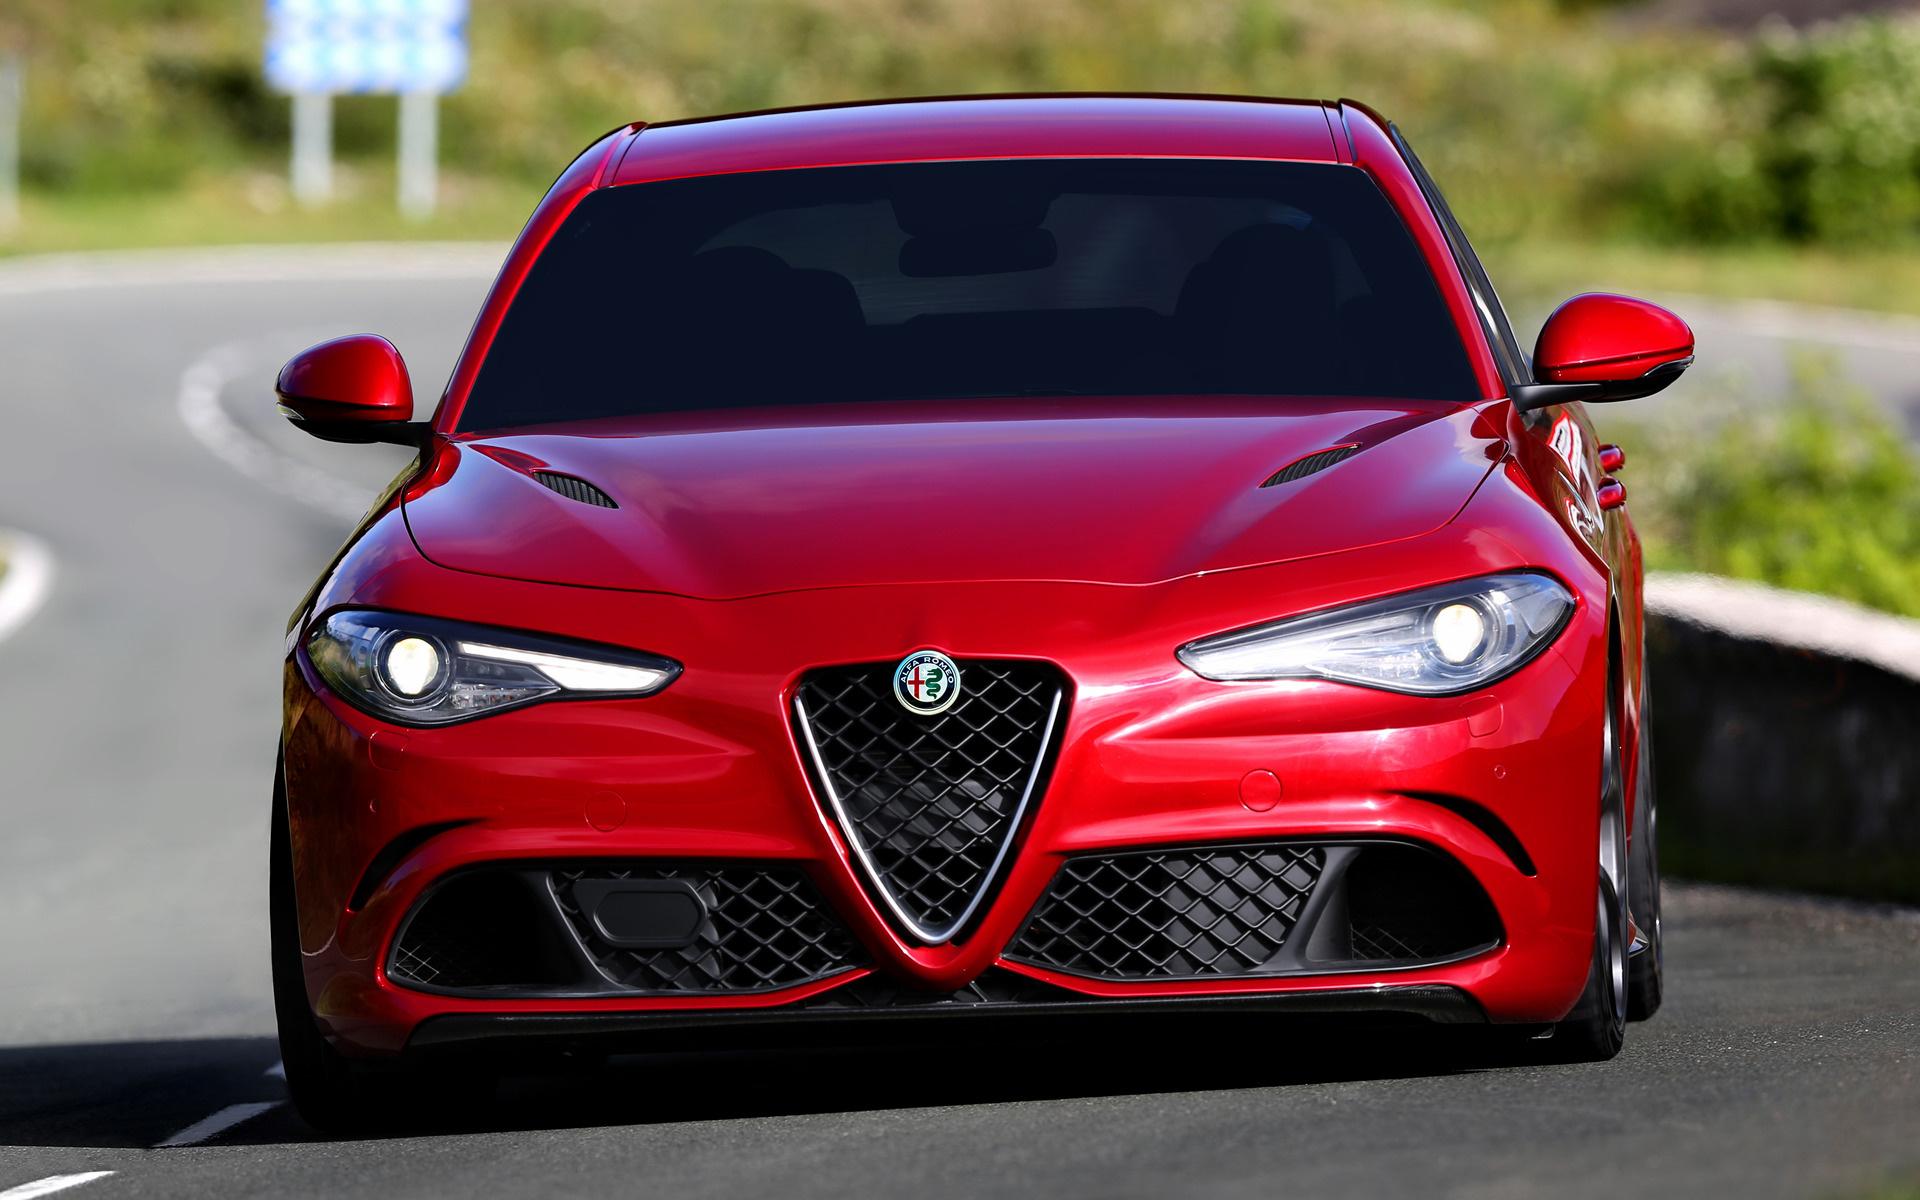 2016 Land Rover >> 2016 Alfa Romeo Giulia Quadrifoglio - Wallpapers and HD Images   Car Pixel